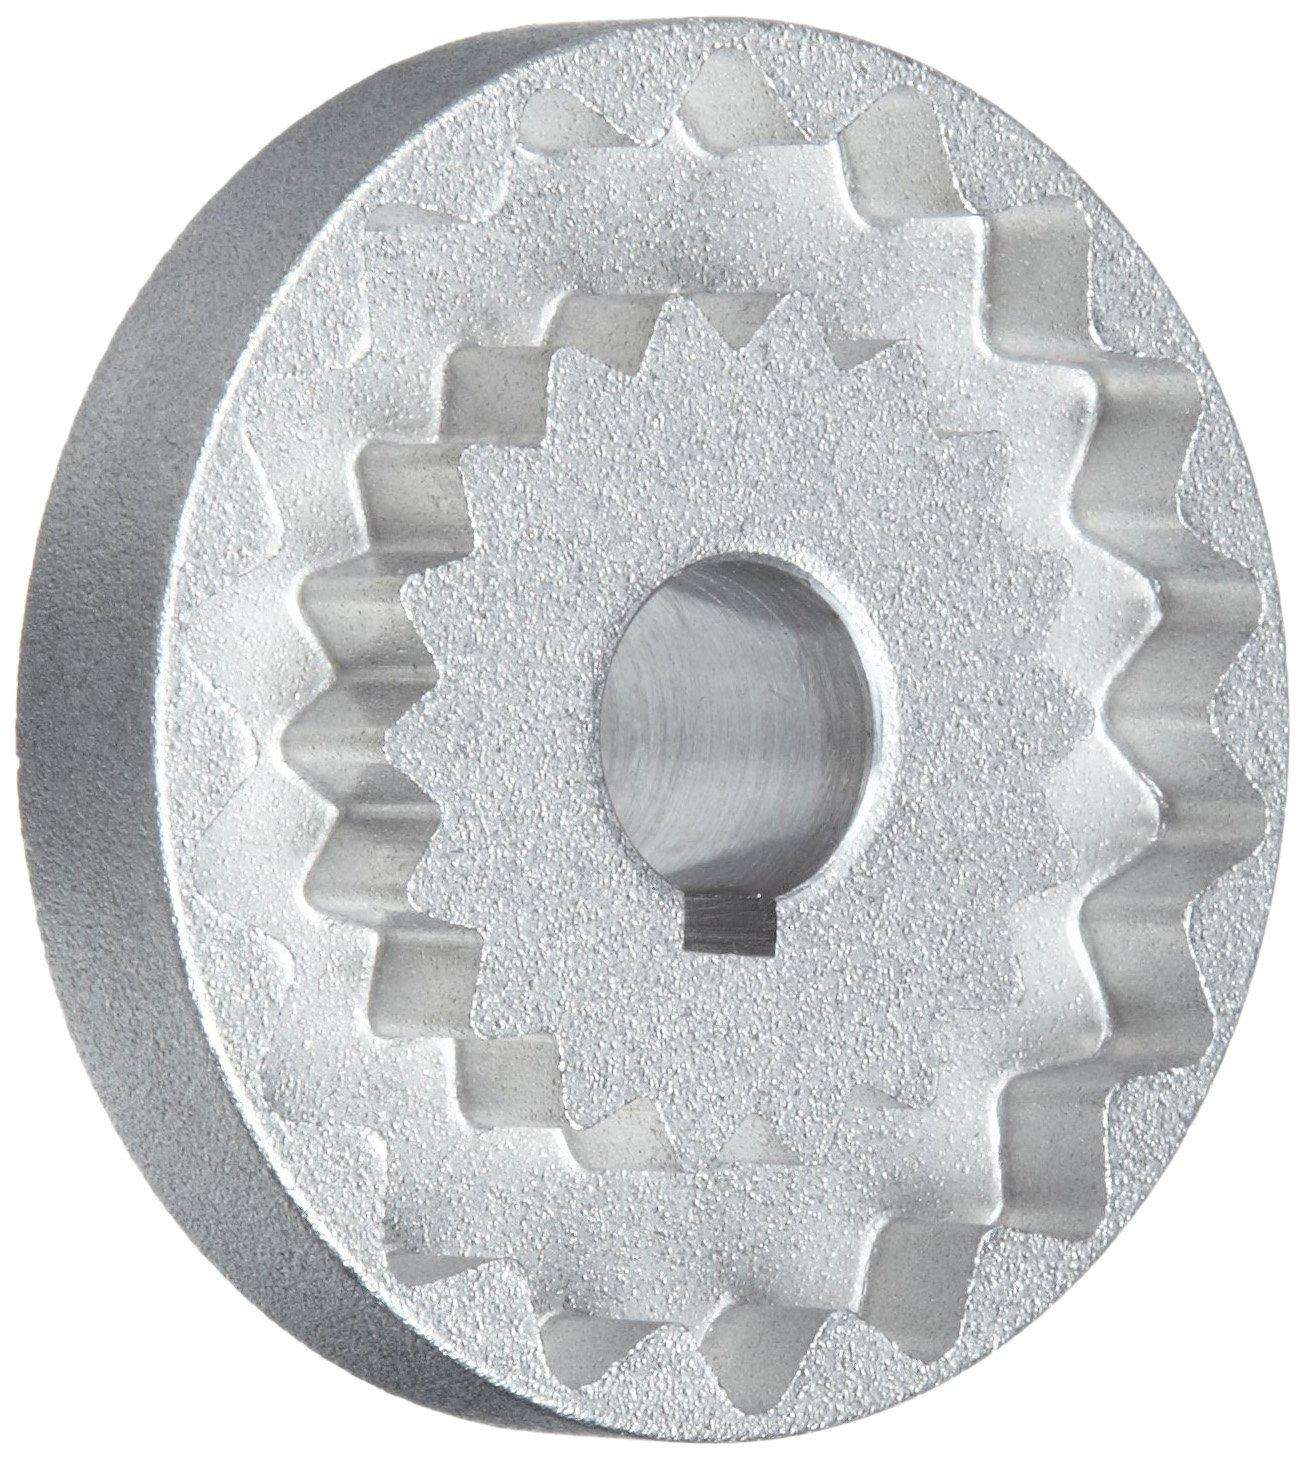 15 mm Bore A 15 mm Bore B Metric Sintered Steel 60.325 mm Length 62.484 mm OD Martin 4J Quadraflex Coupling Flange